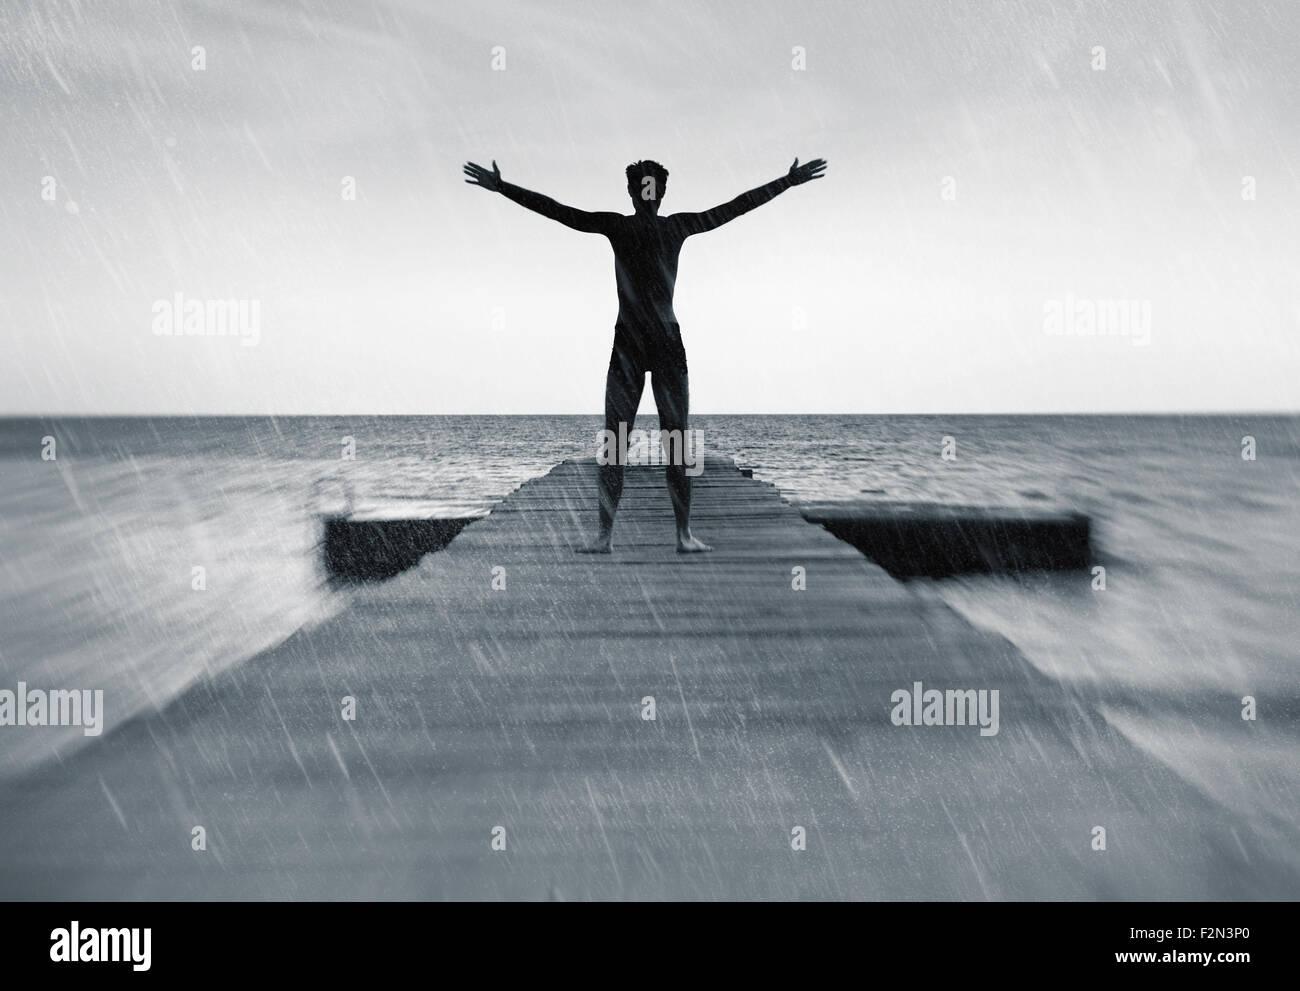 Libertad en el concepto de naturaleza - gratis hombre feliz en la lluvia Imagen De Stock